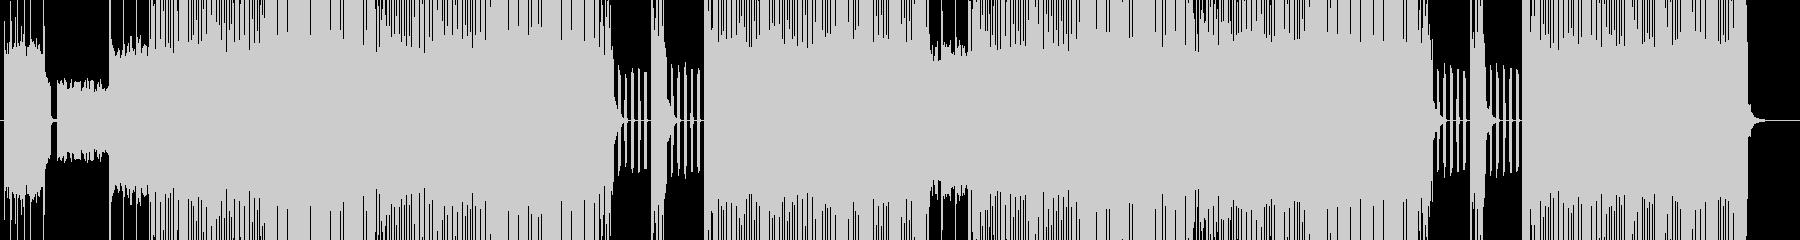 「HARD/HEAVY」BGM32の未再生の波形